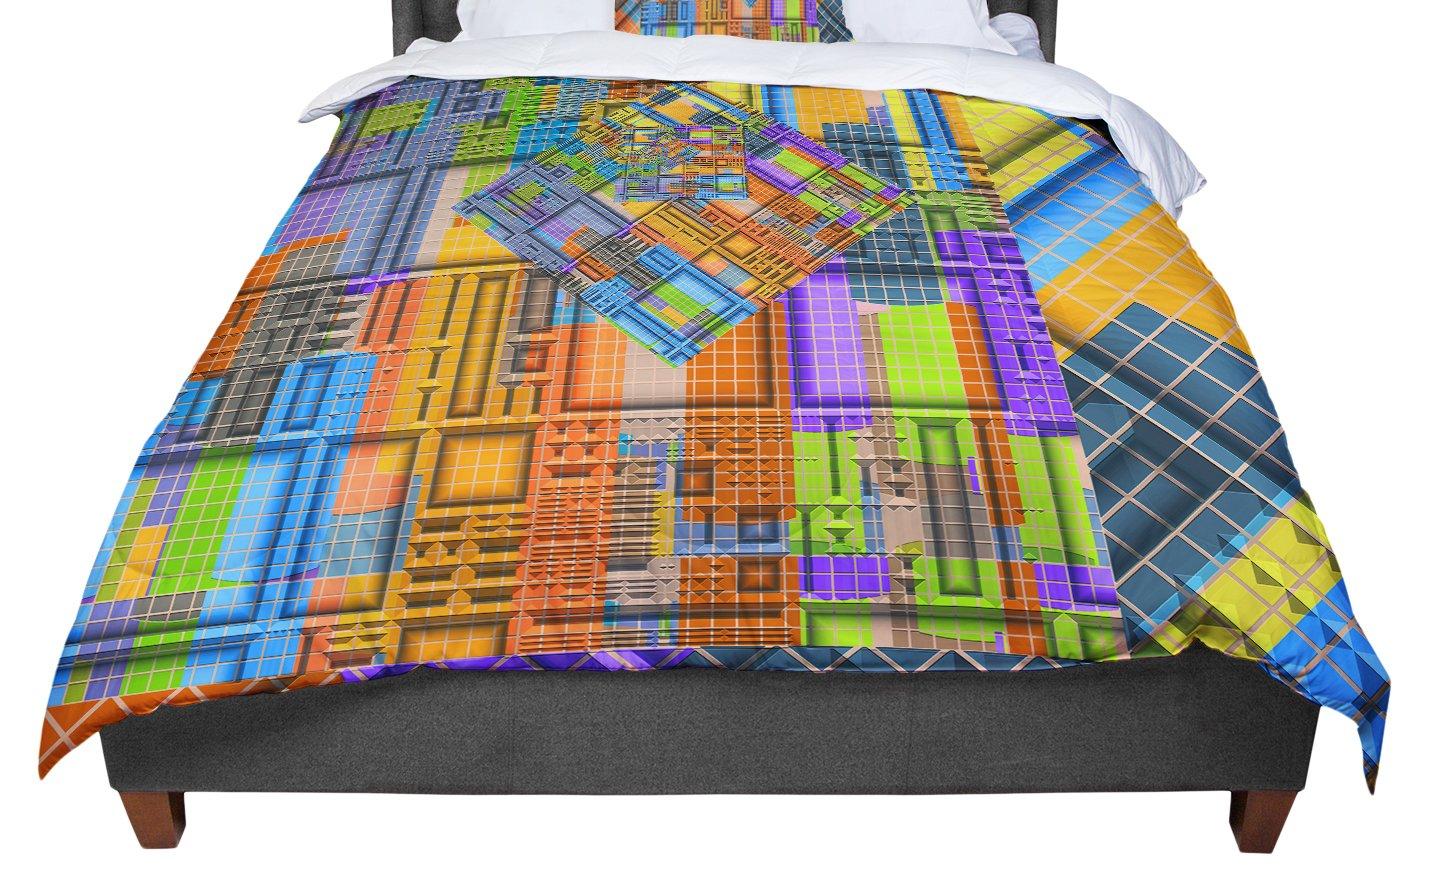 KESS InHouse Michael Sussna Tile Rep Abstract Queen Comforter 88 X 88